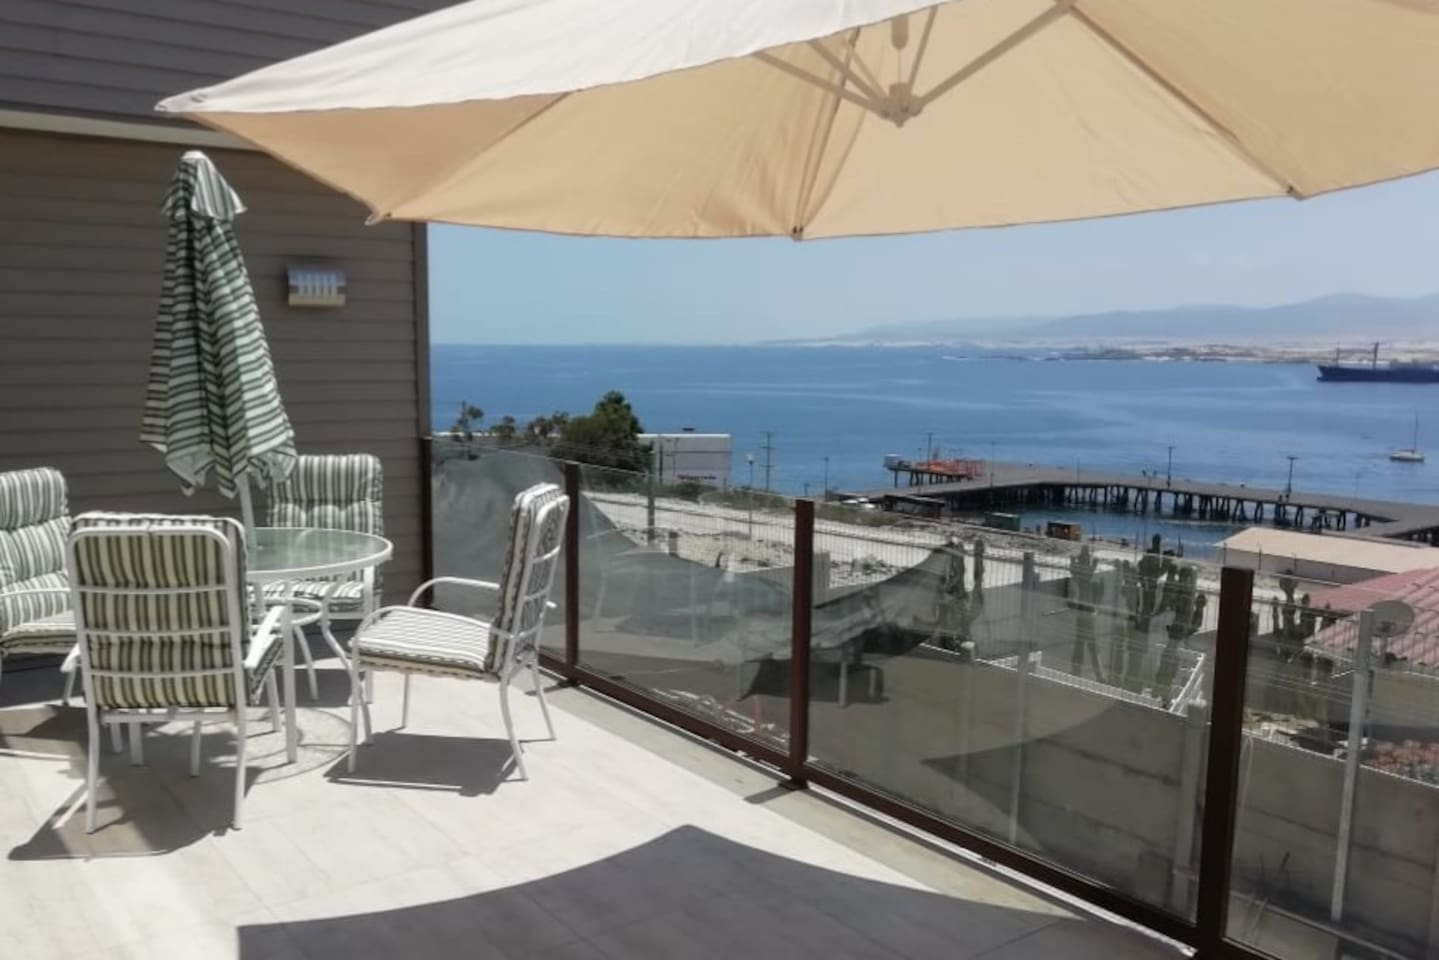 Espectacular terraza vista al mar panorámica